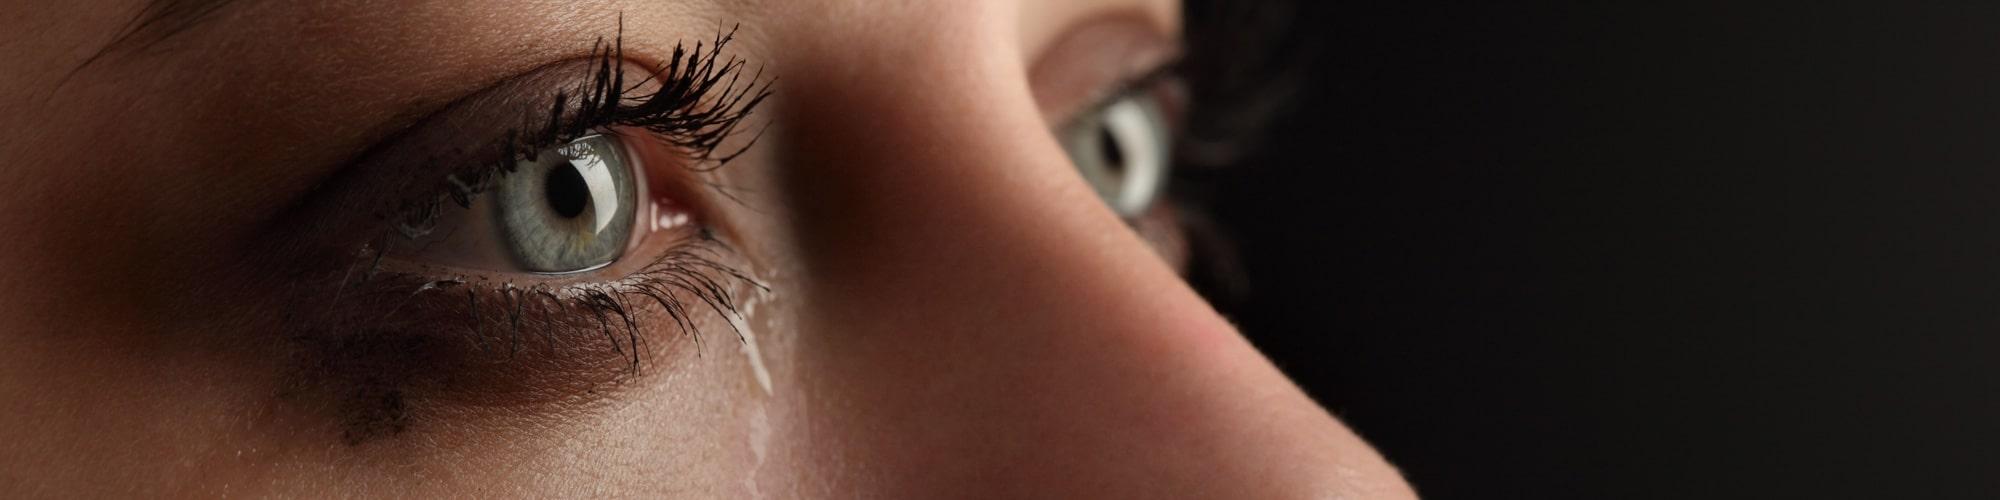 depression-stress-krise-vivi-hinrichs